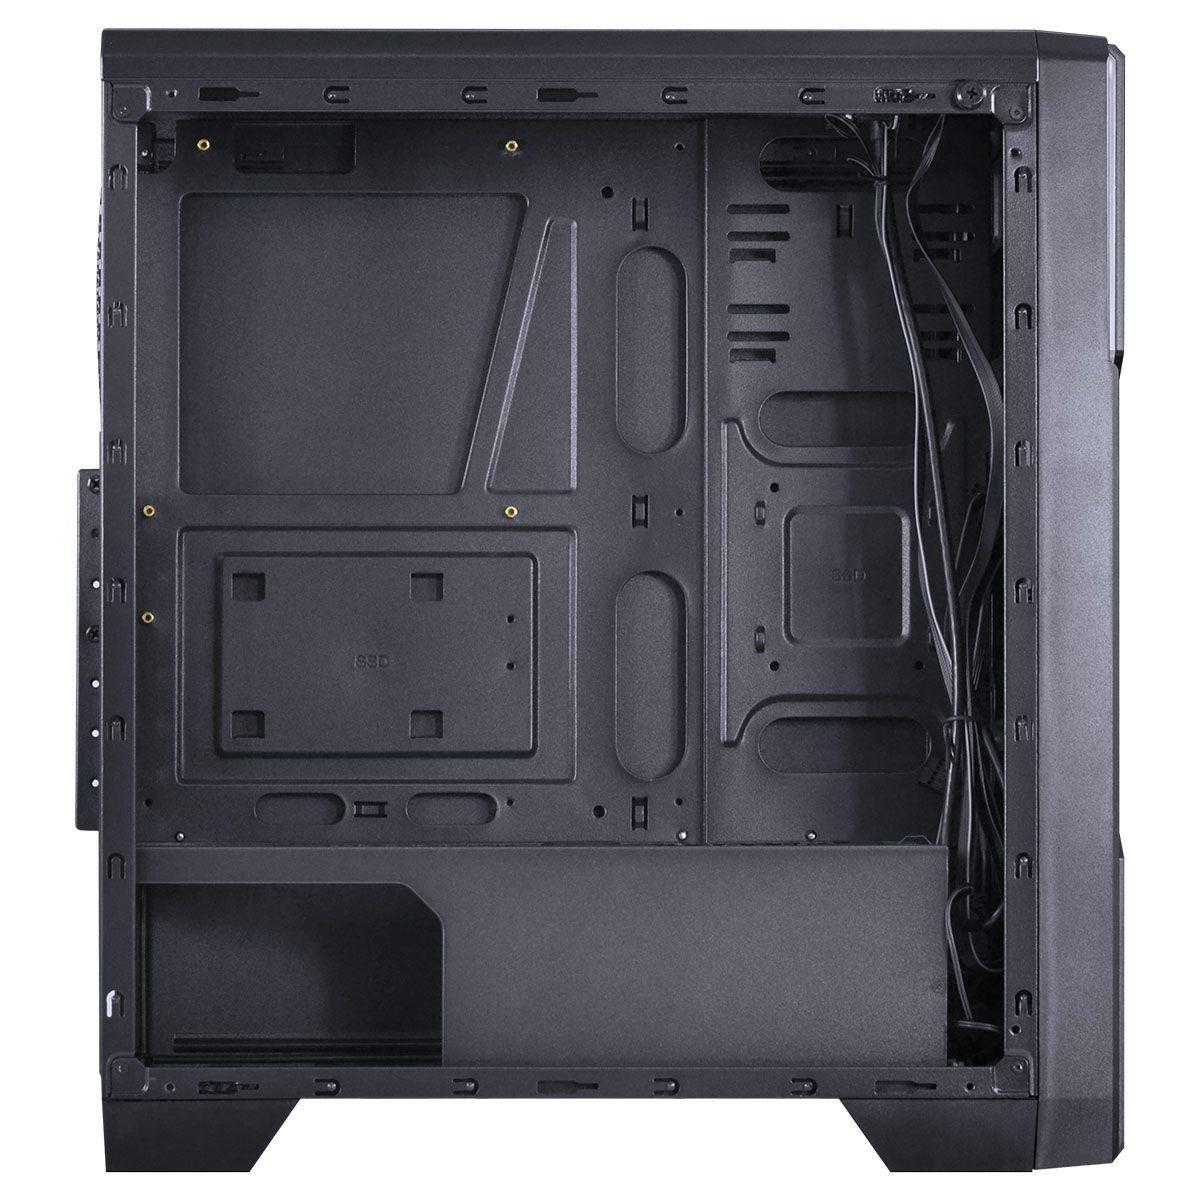 Gabinete ATX Gamer Tron Preto 7 Cores LED Janela Acrílico Fume Full Window 09GATR-7 - Vinik